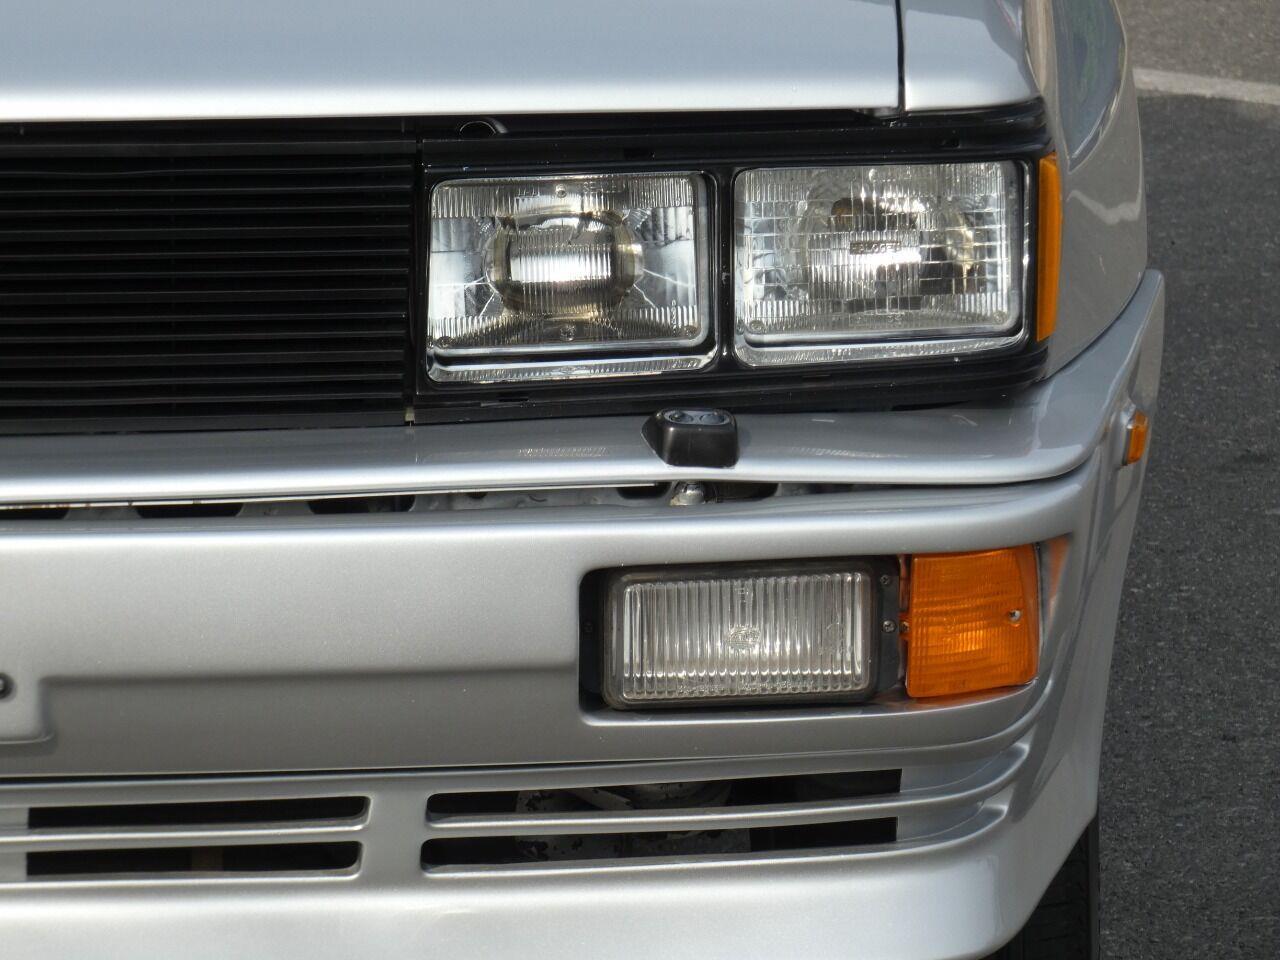 1981 Audi Quattro (CC-1394227) for sale in Hailey, Idaho